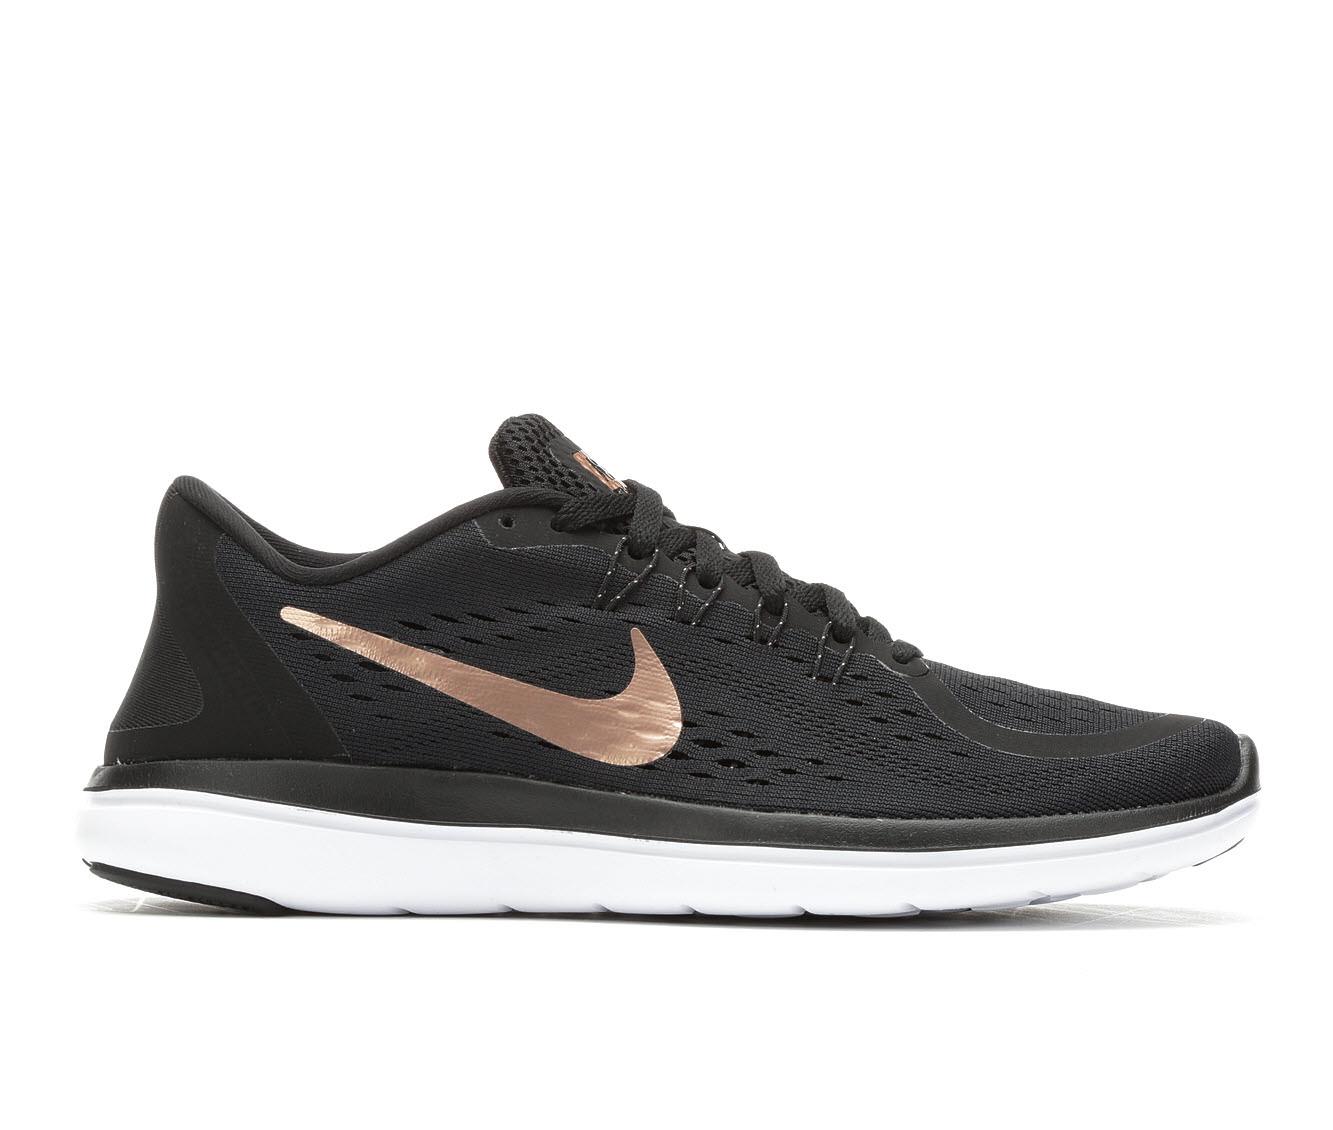 Women's Nike Flex Run 2017 Running Shoes (Black - Size 5.5) 1689421